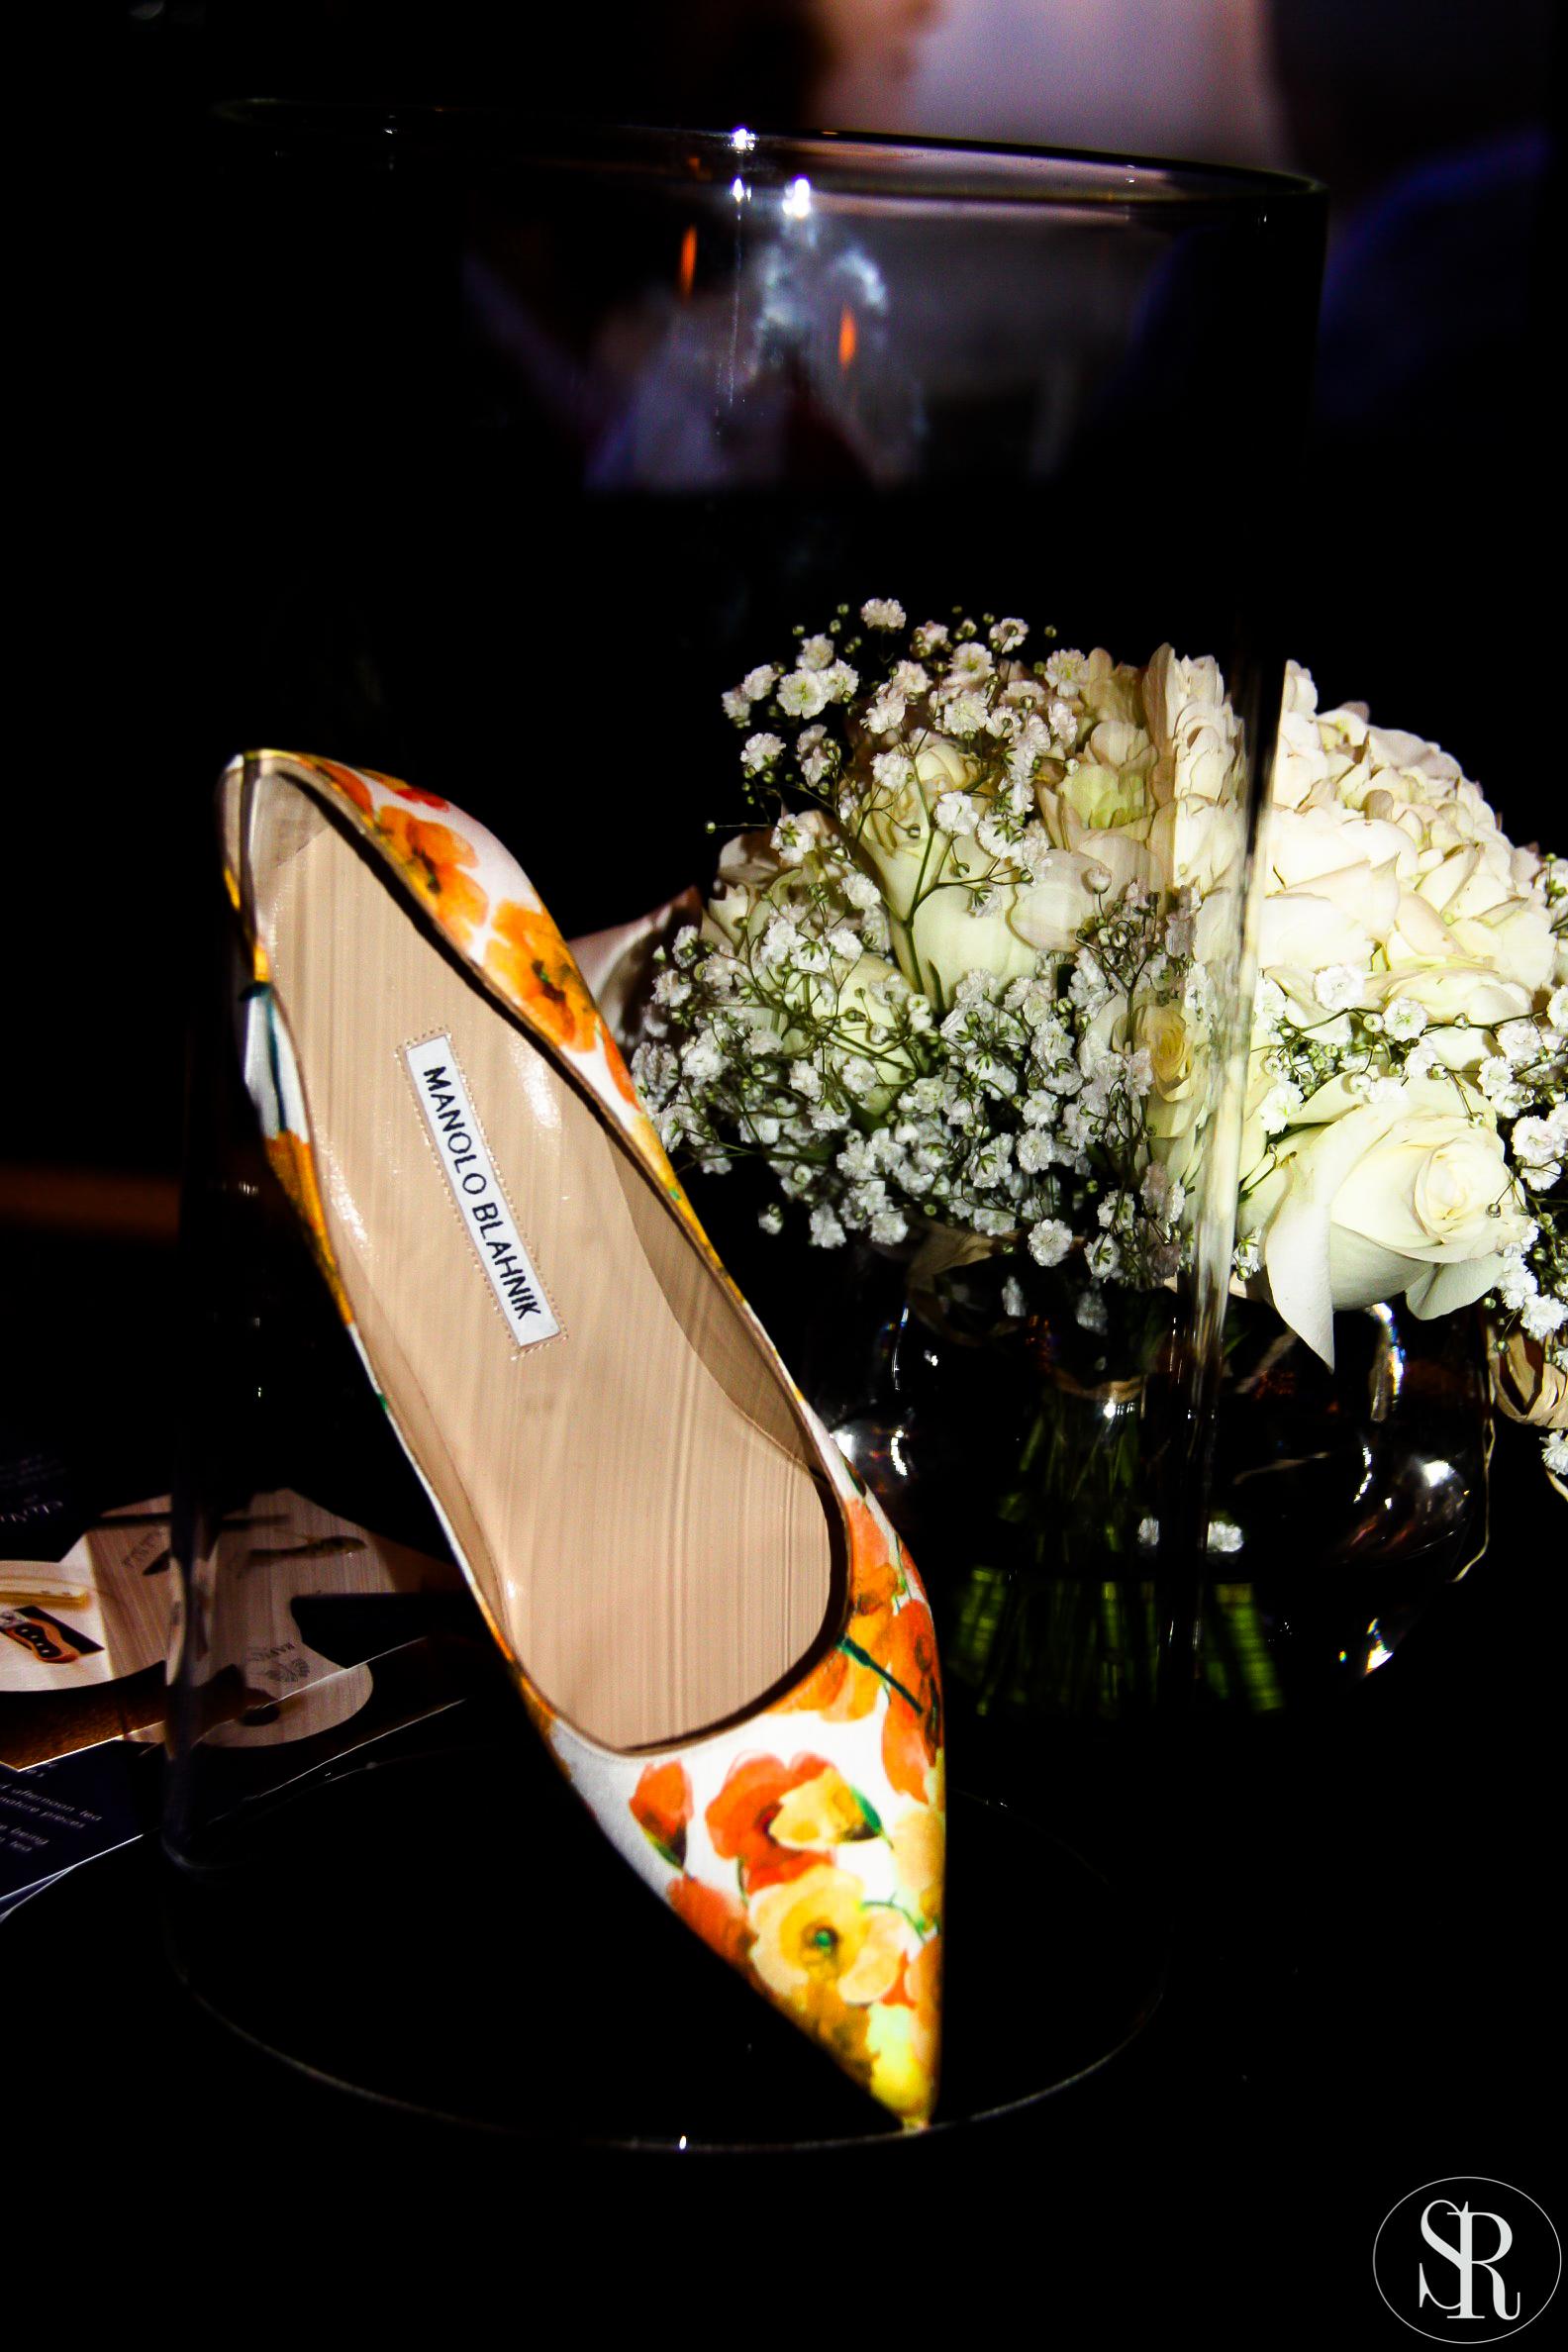 VIP launch of MANOLO BLAHNIK collection Fashion Afternoon Tea by Raffles Dubai-4169.jpg